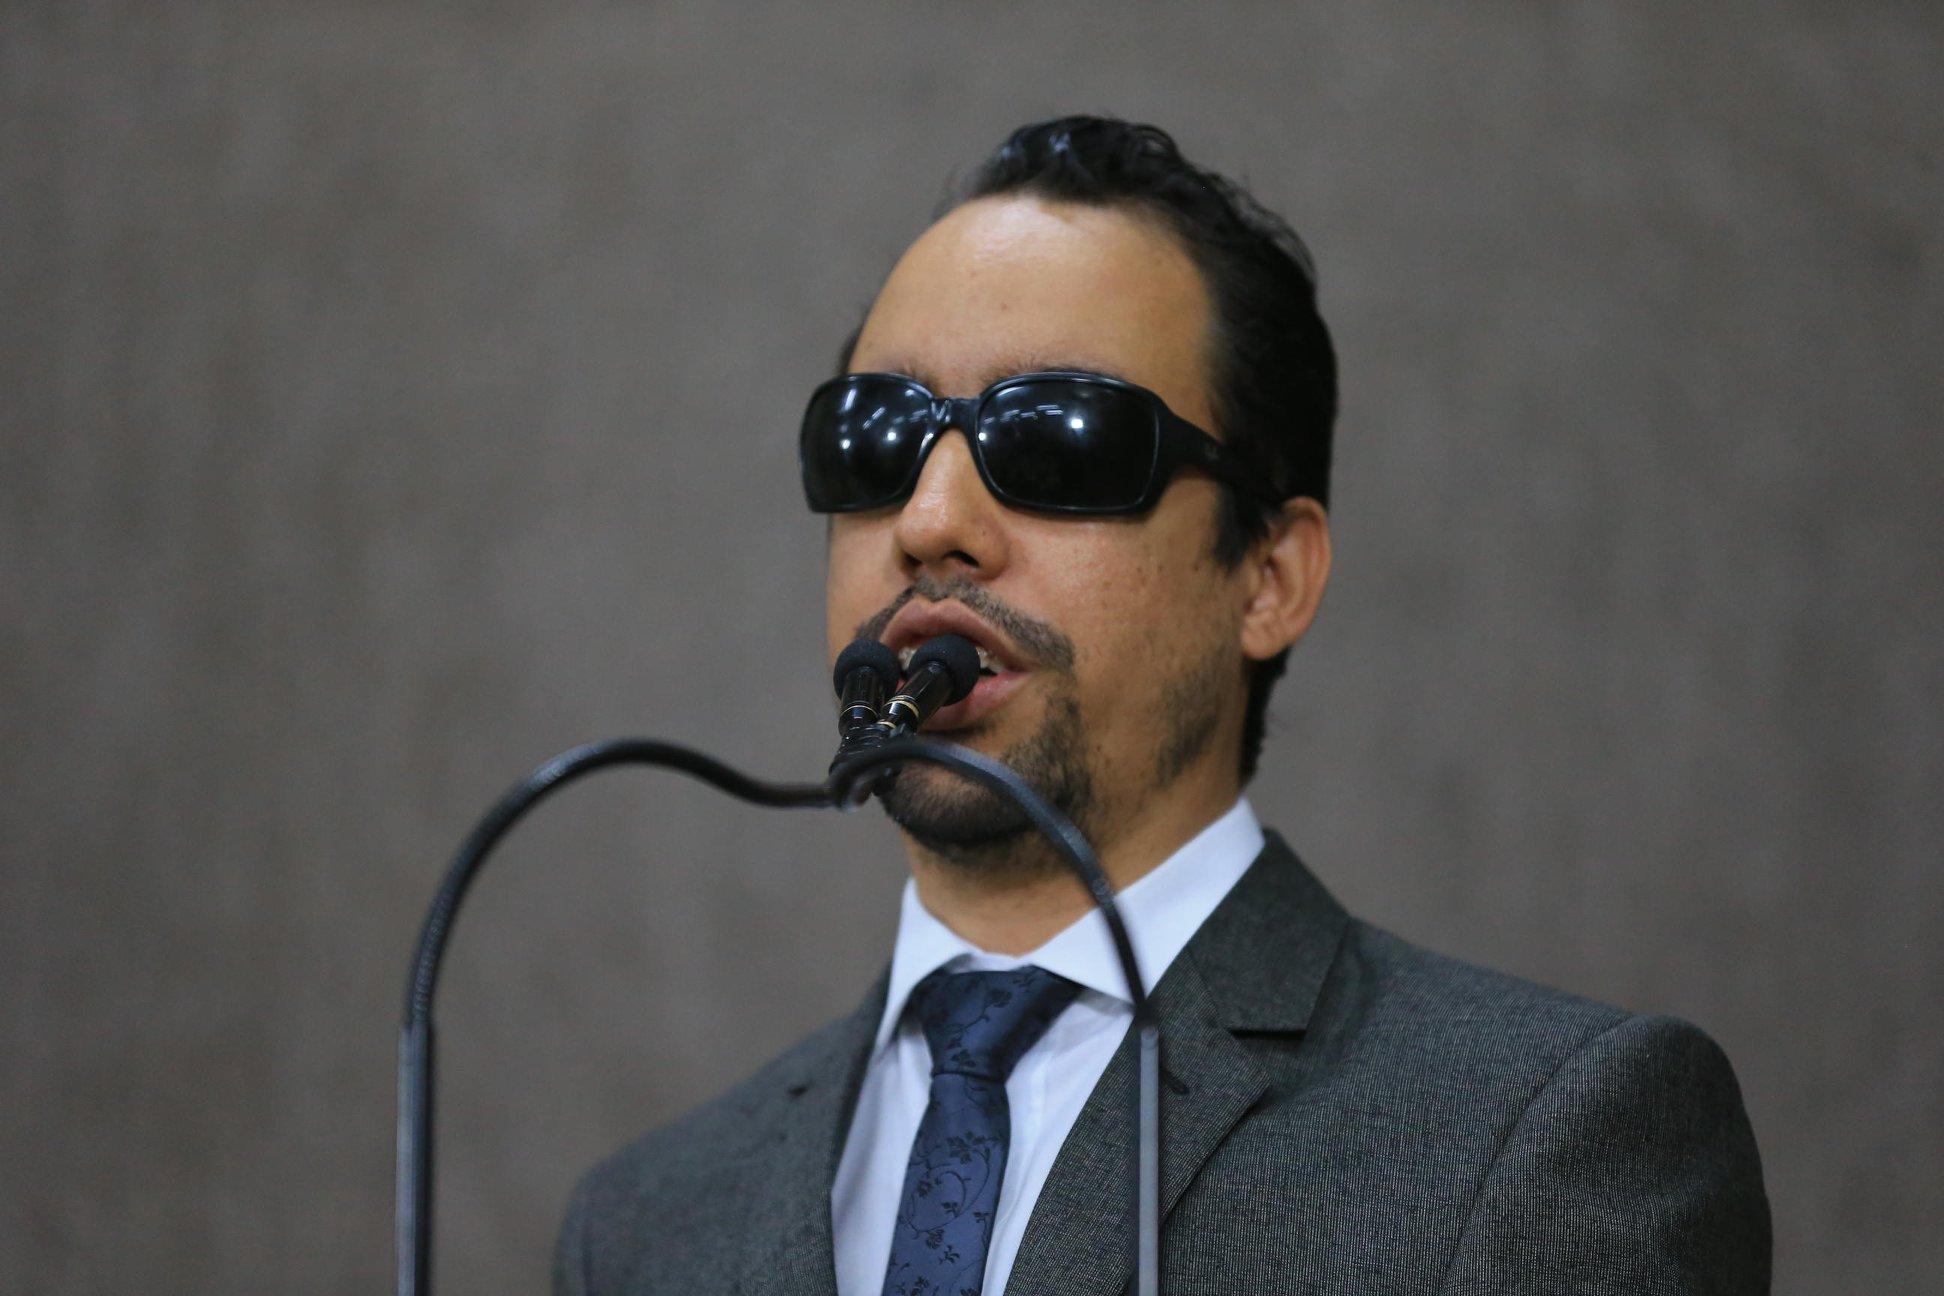 #PraTodoMundoVer Lucas falando ao microfone na tribuna. Ele usa terno cinza e gravata azul.